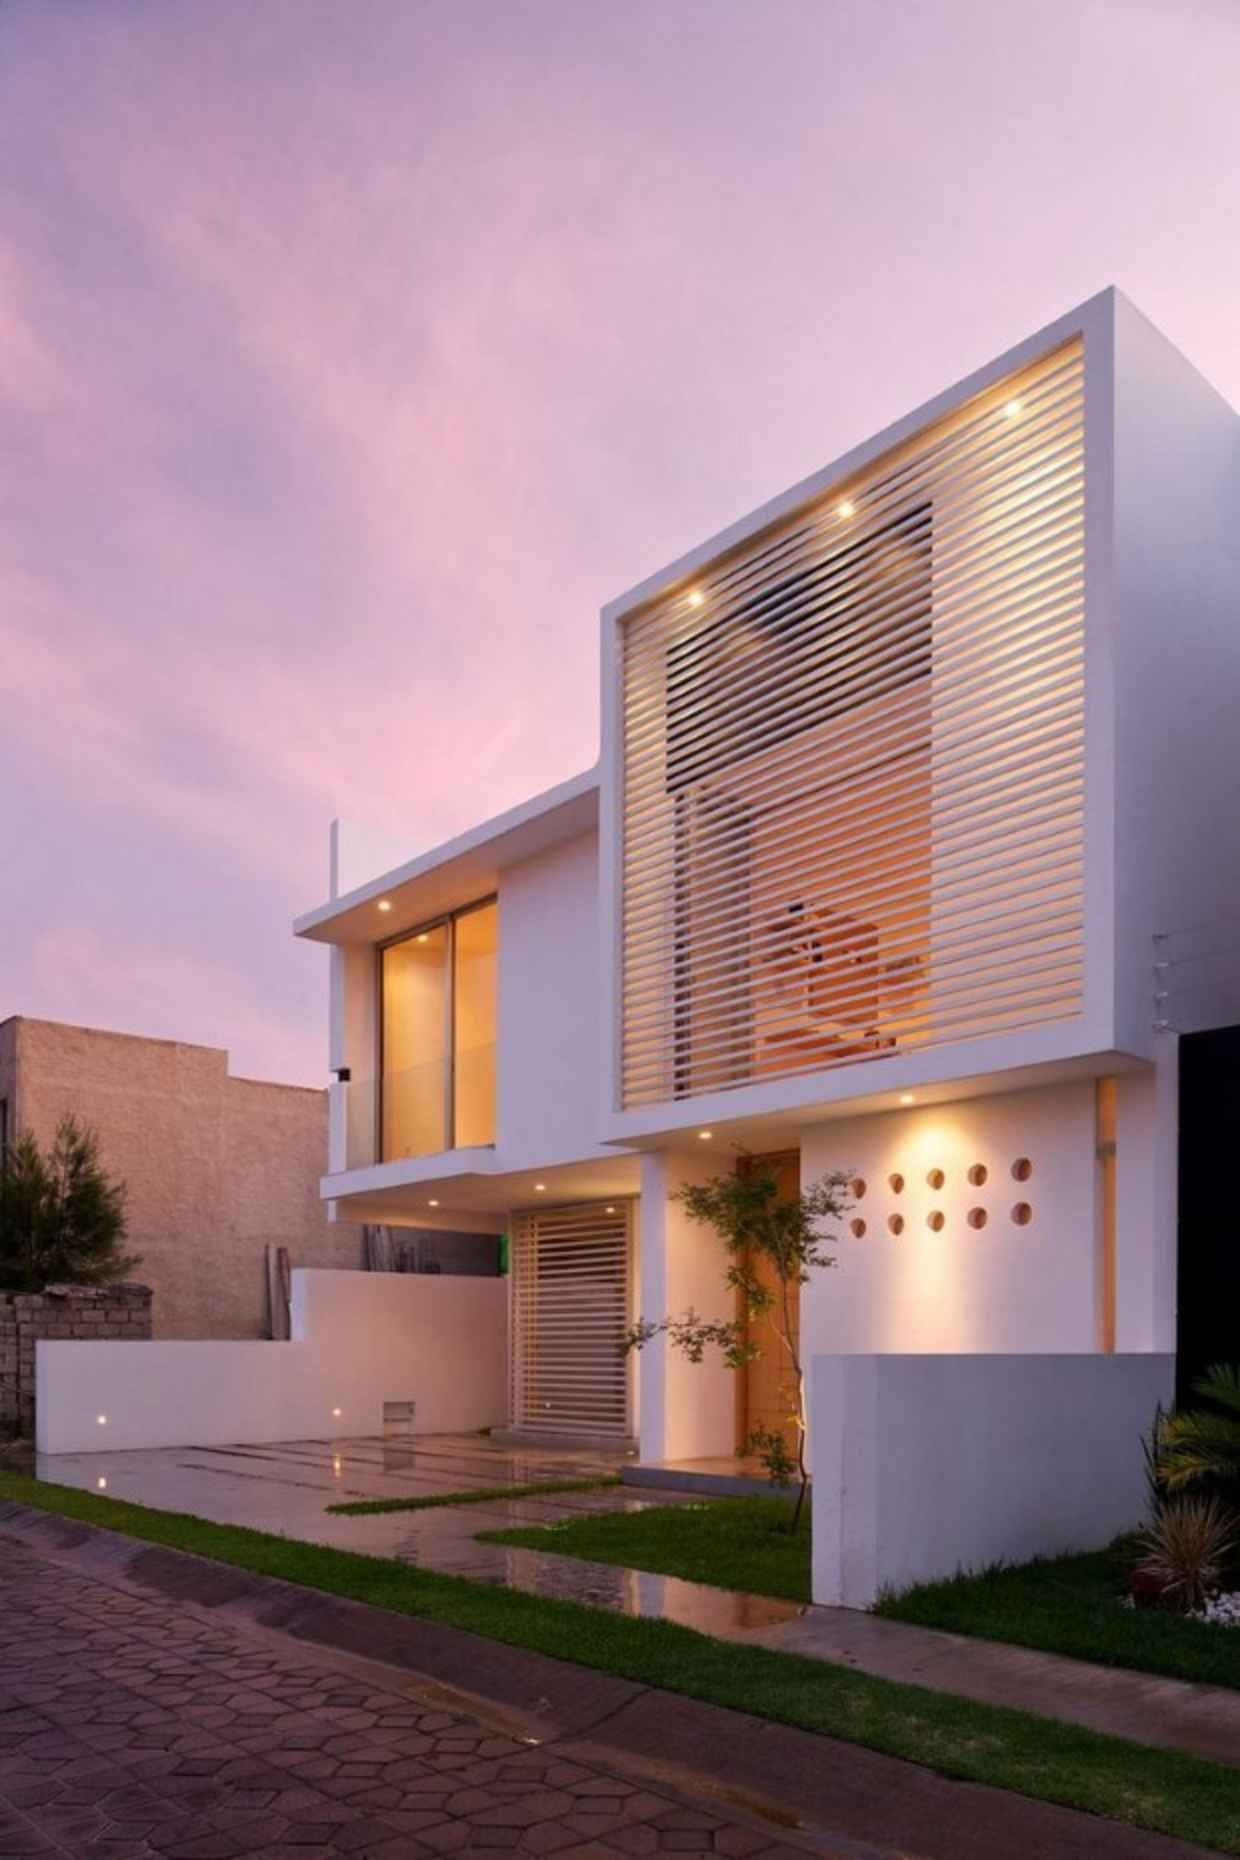 40 Minimalist Style Houses Architecture Minimalist Architecture Modern Architecture